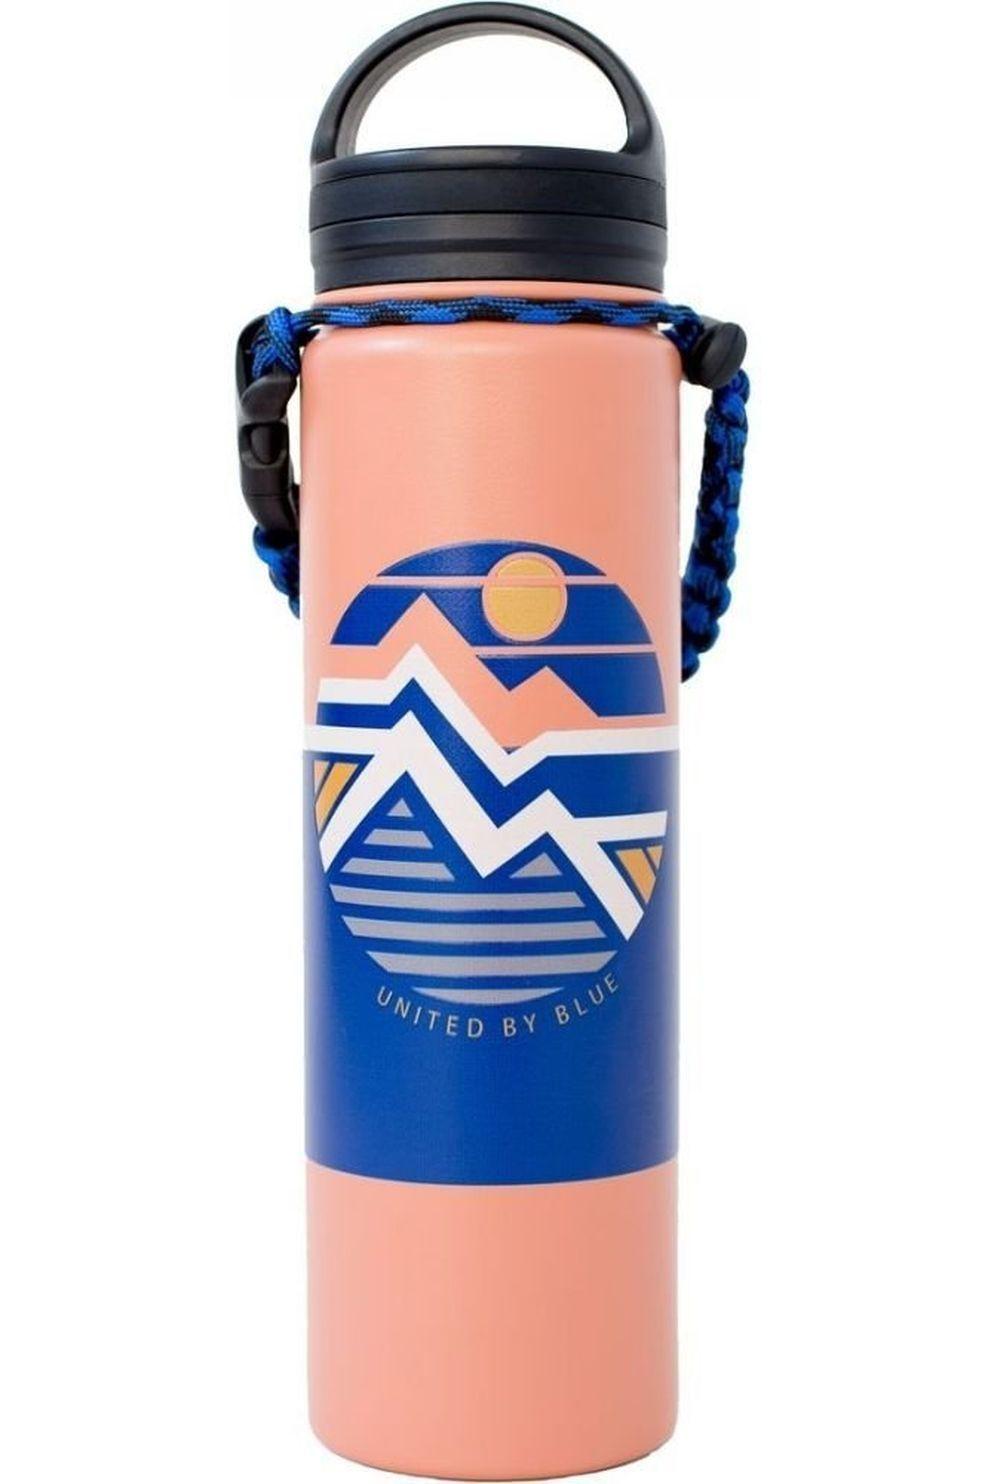 United by Blue Drinkfles Field Guide 22Oz Stainless Steel - Oranje/Blauw